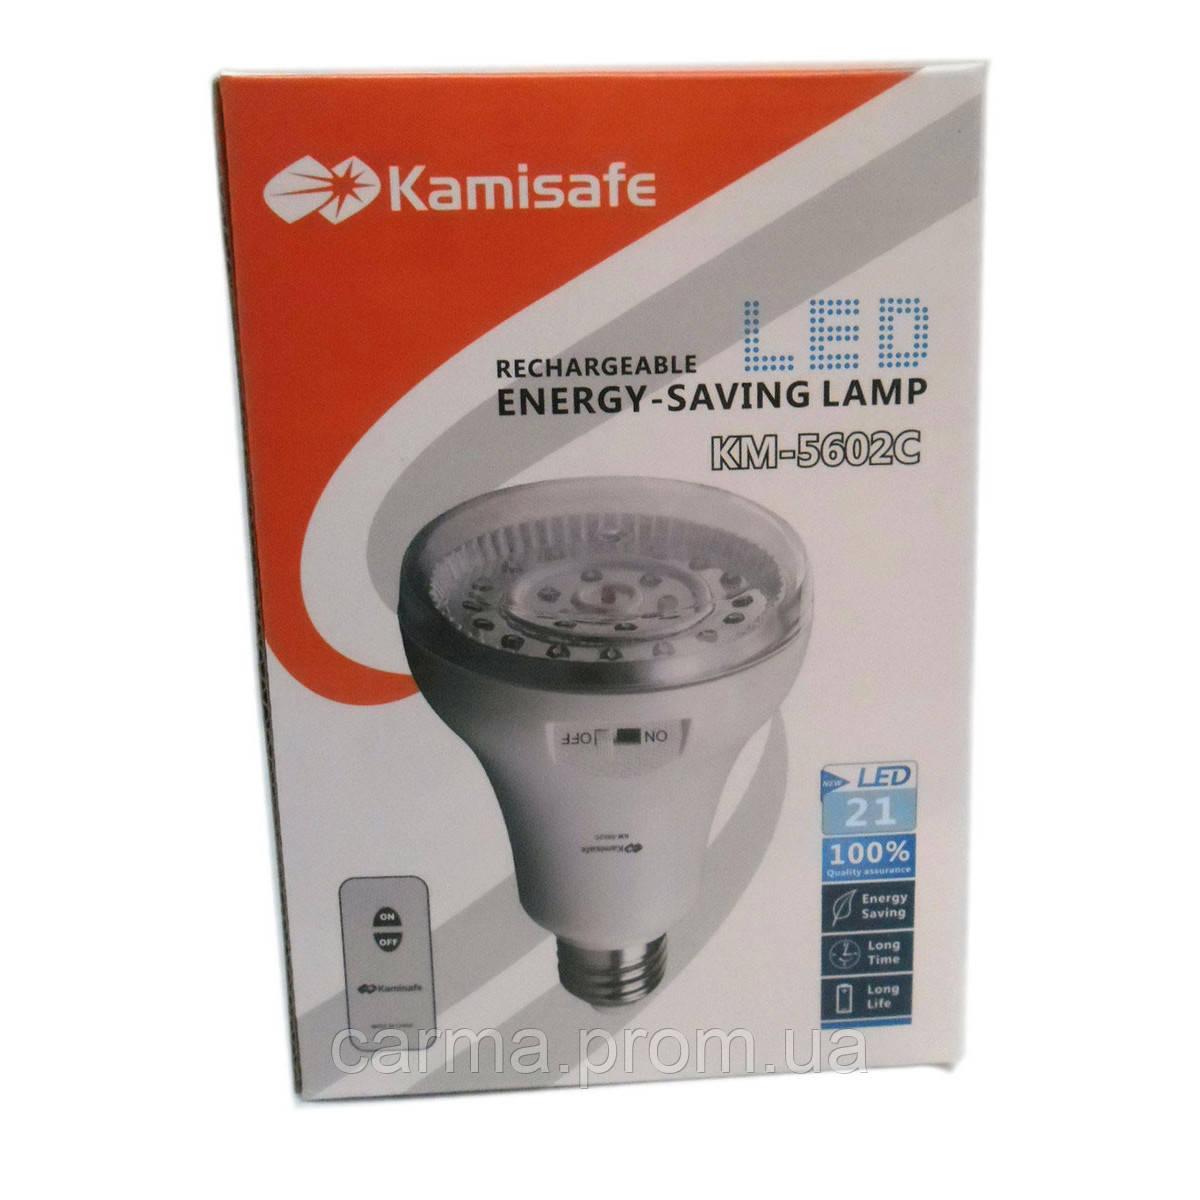 Аварийная лампа Kamisafe KM-5602C на 21 светодиодод Белый